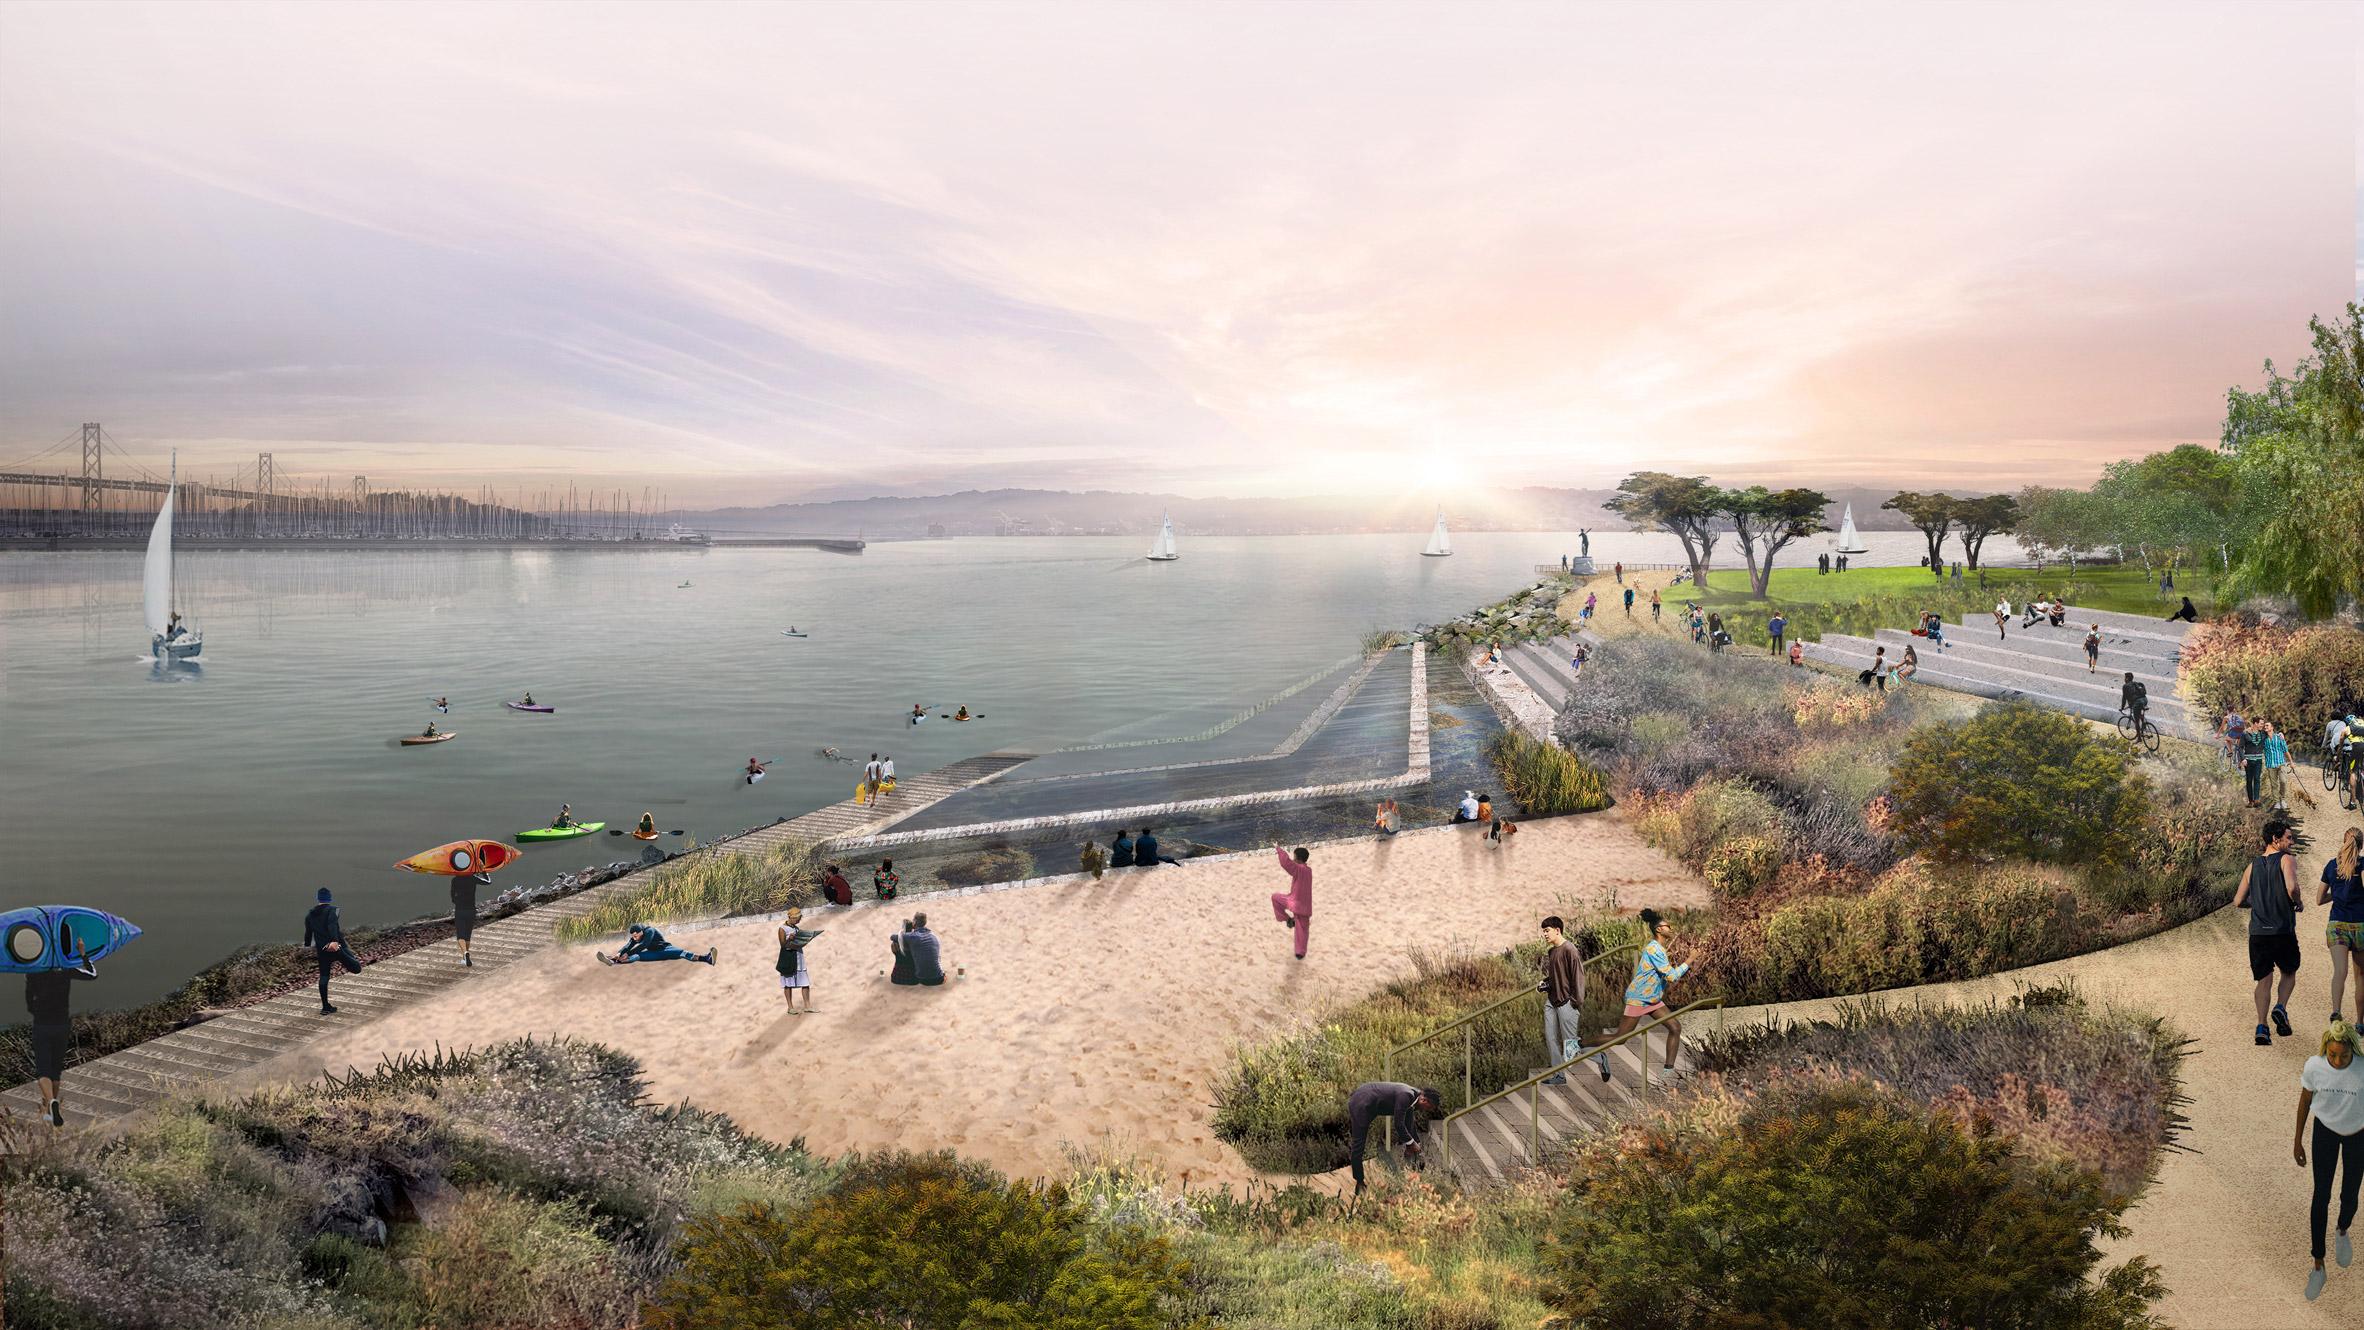 Mission Rock development in San Francisco